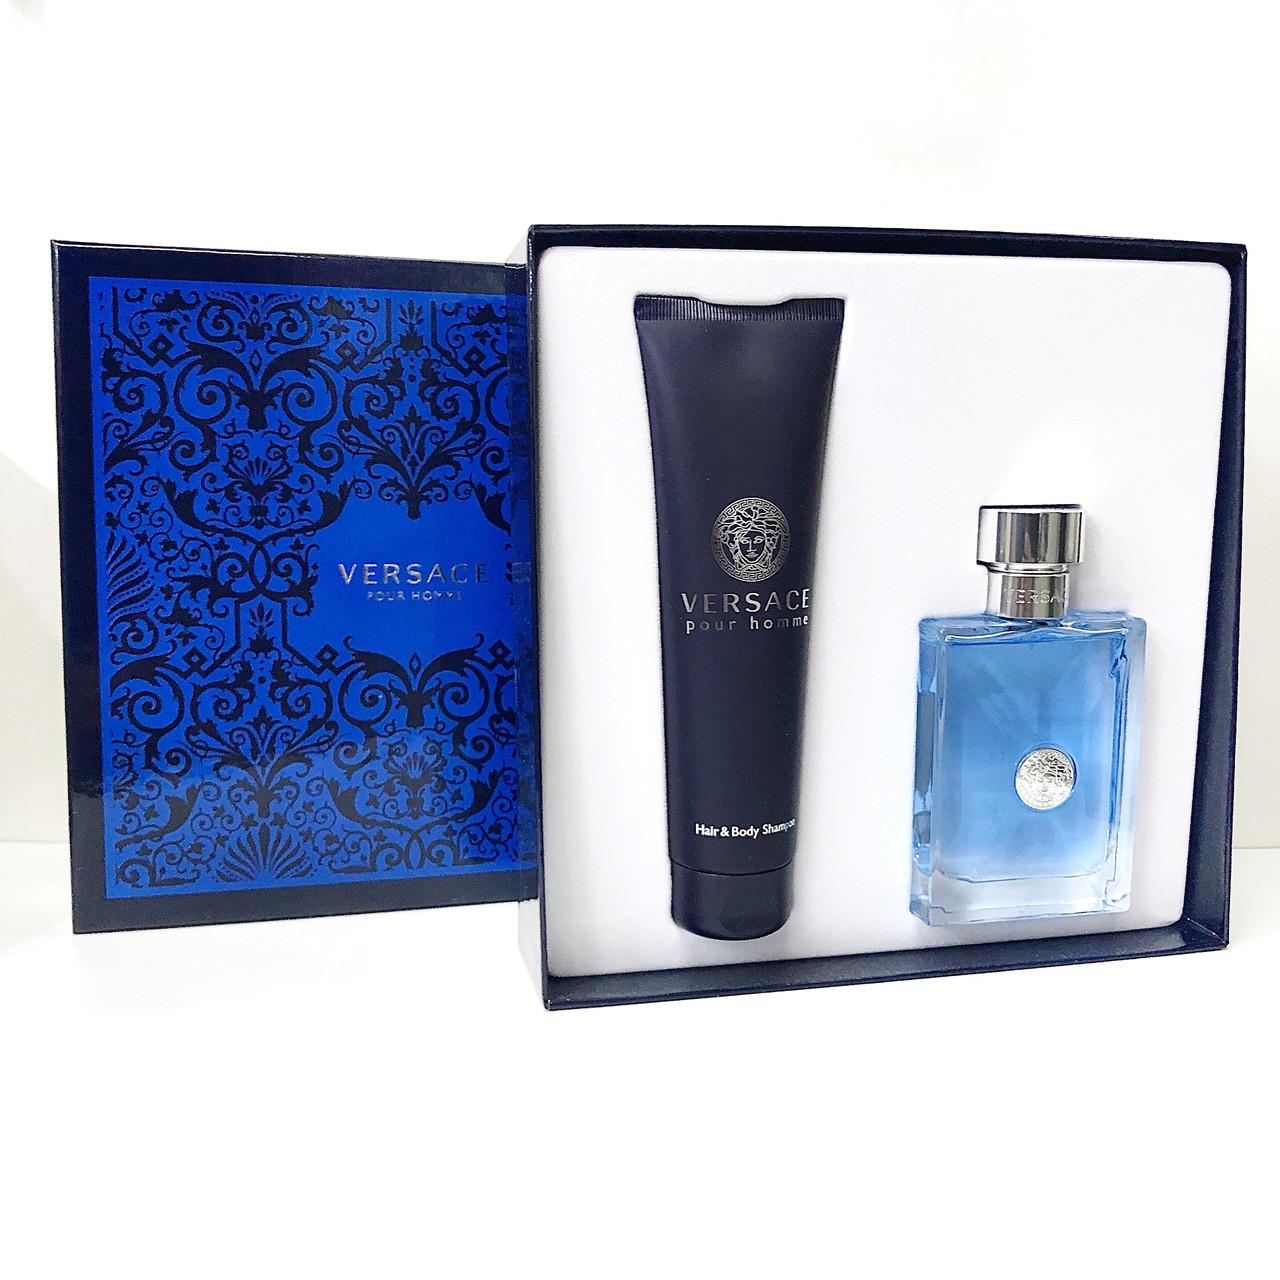 Подарочный набор мужской Versace Pour Homme set туалетная вода 100ml + shower gel 150ml цитрусовый аромат